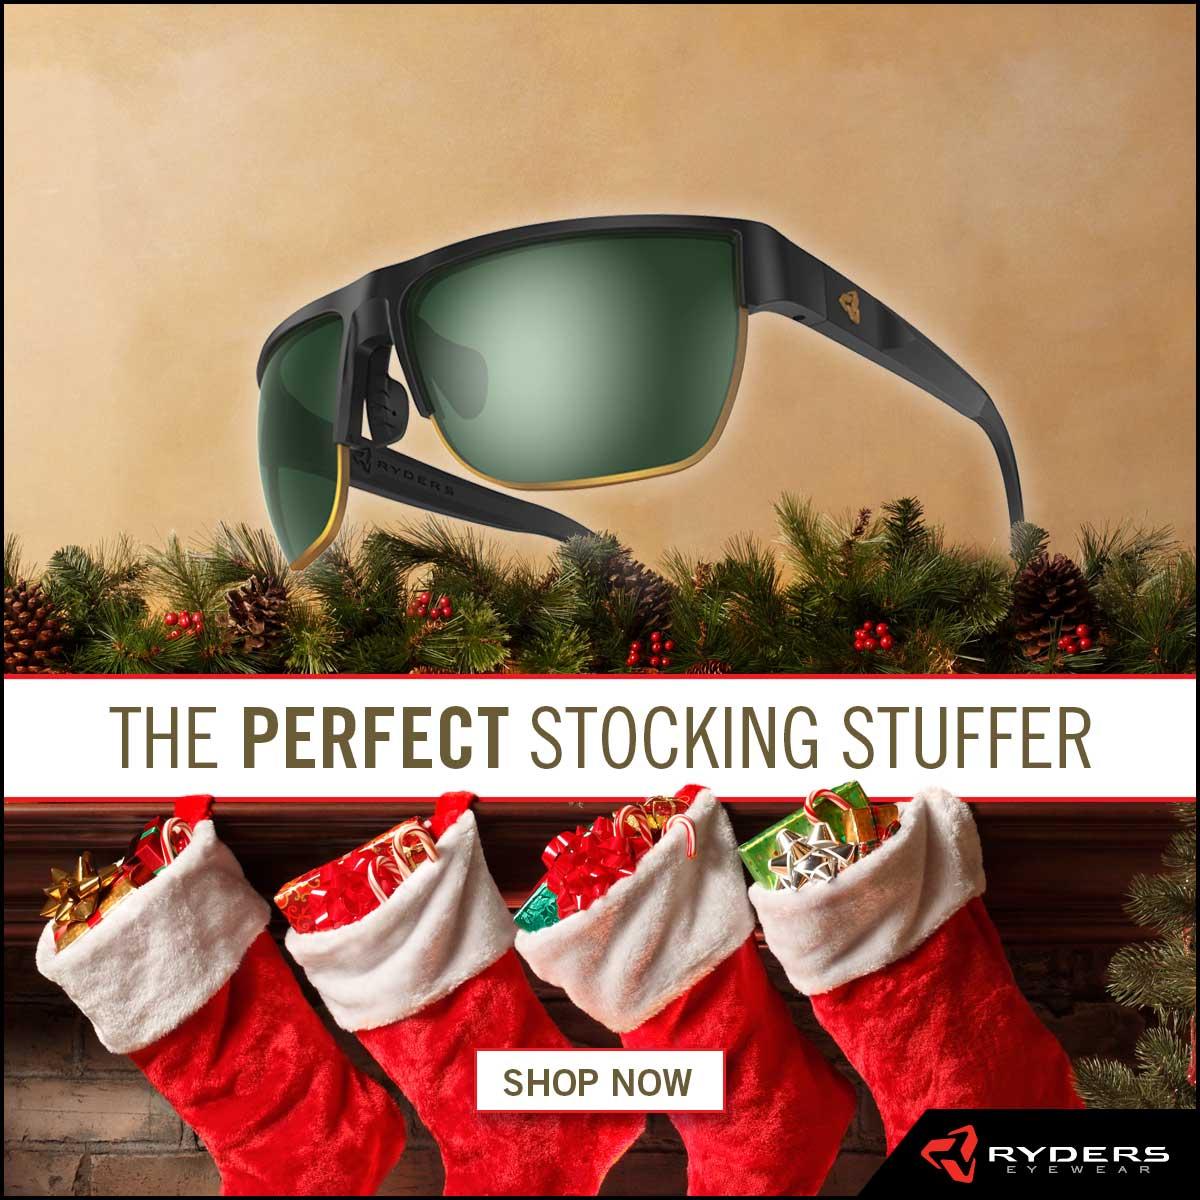 Eyewear is Perfect Stocking Stuffer